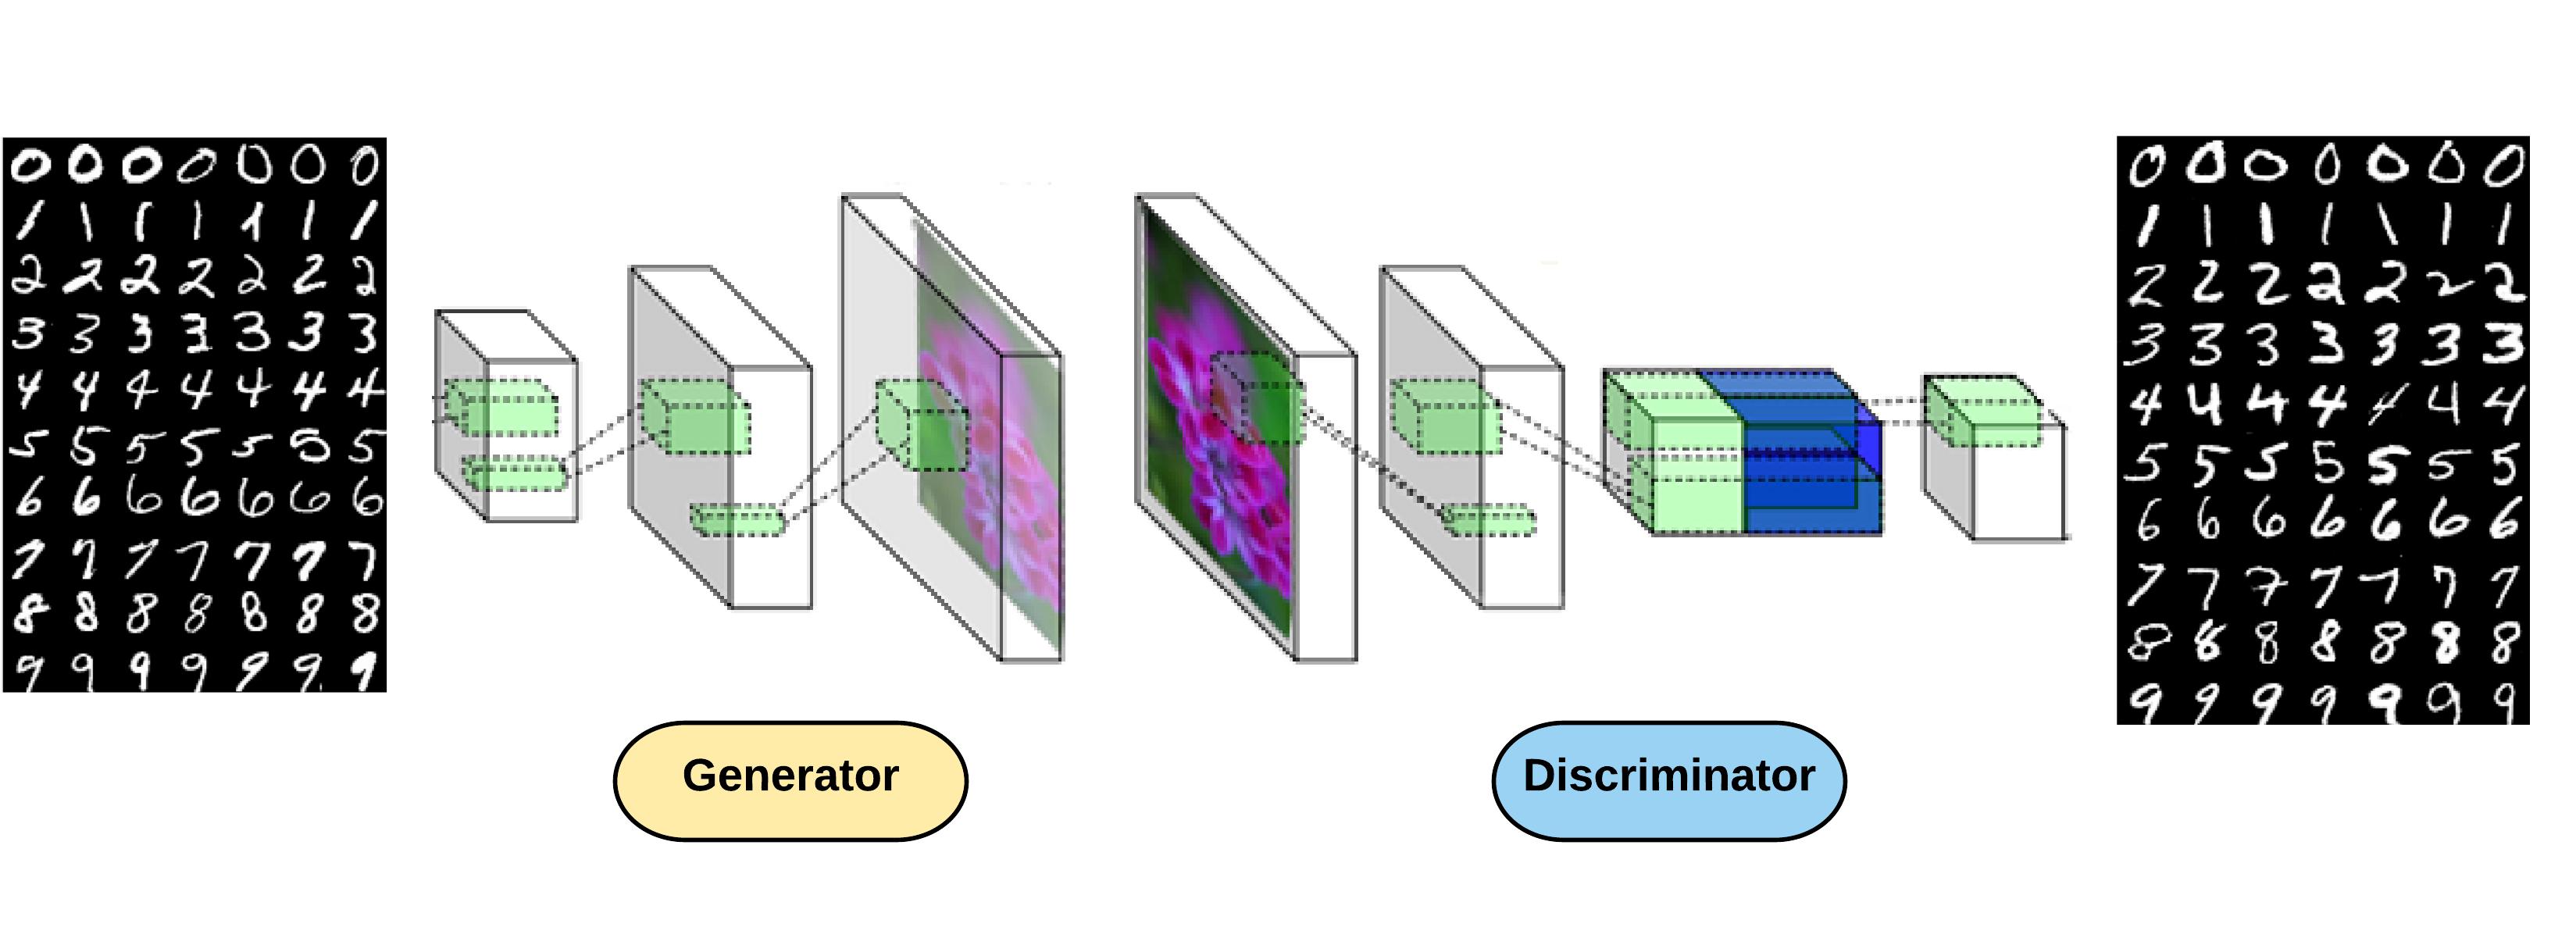 Generative Adversarial Networks